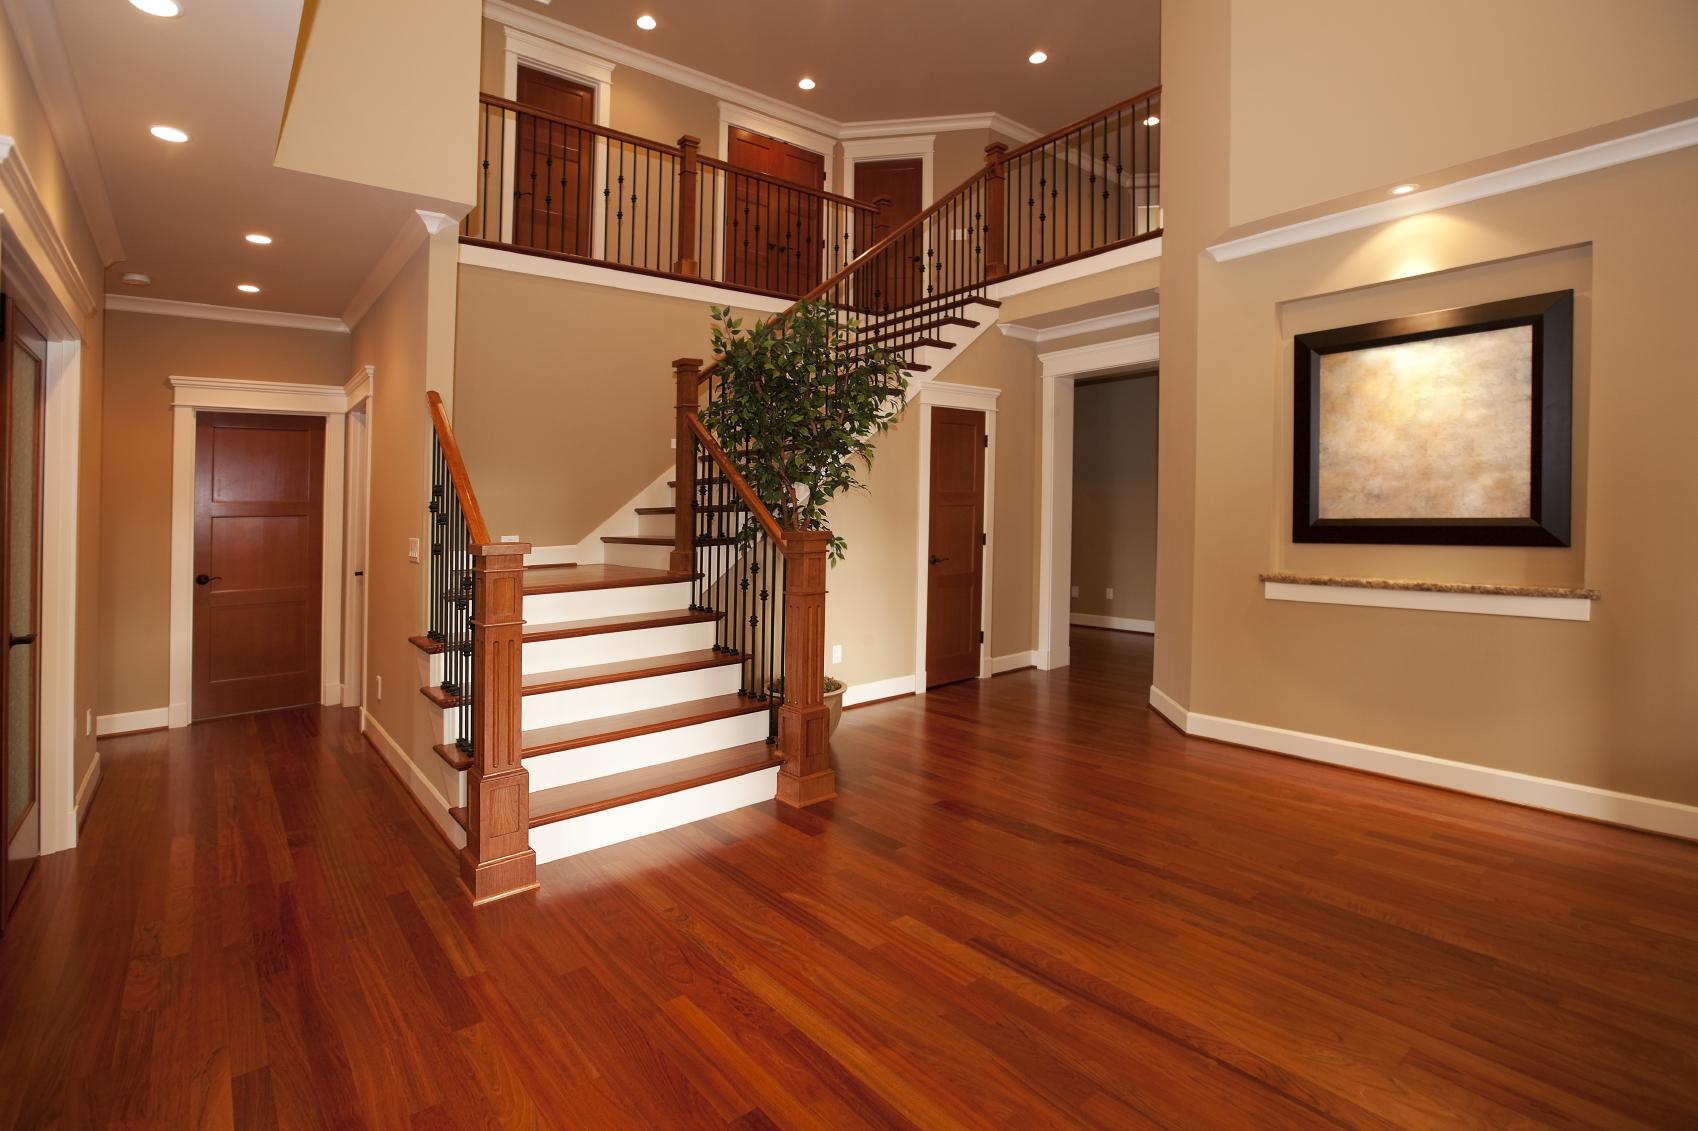 tips when considering installing hardwood floors home improvement ideas u0026 tips